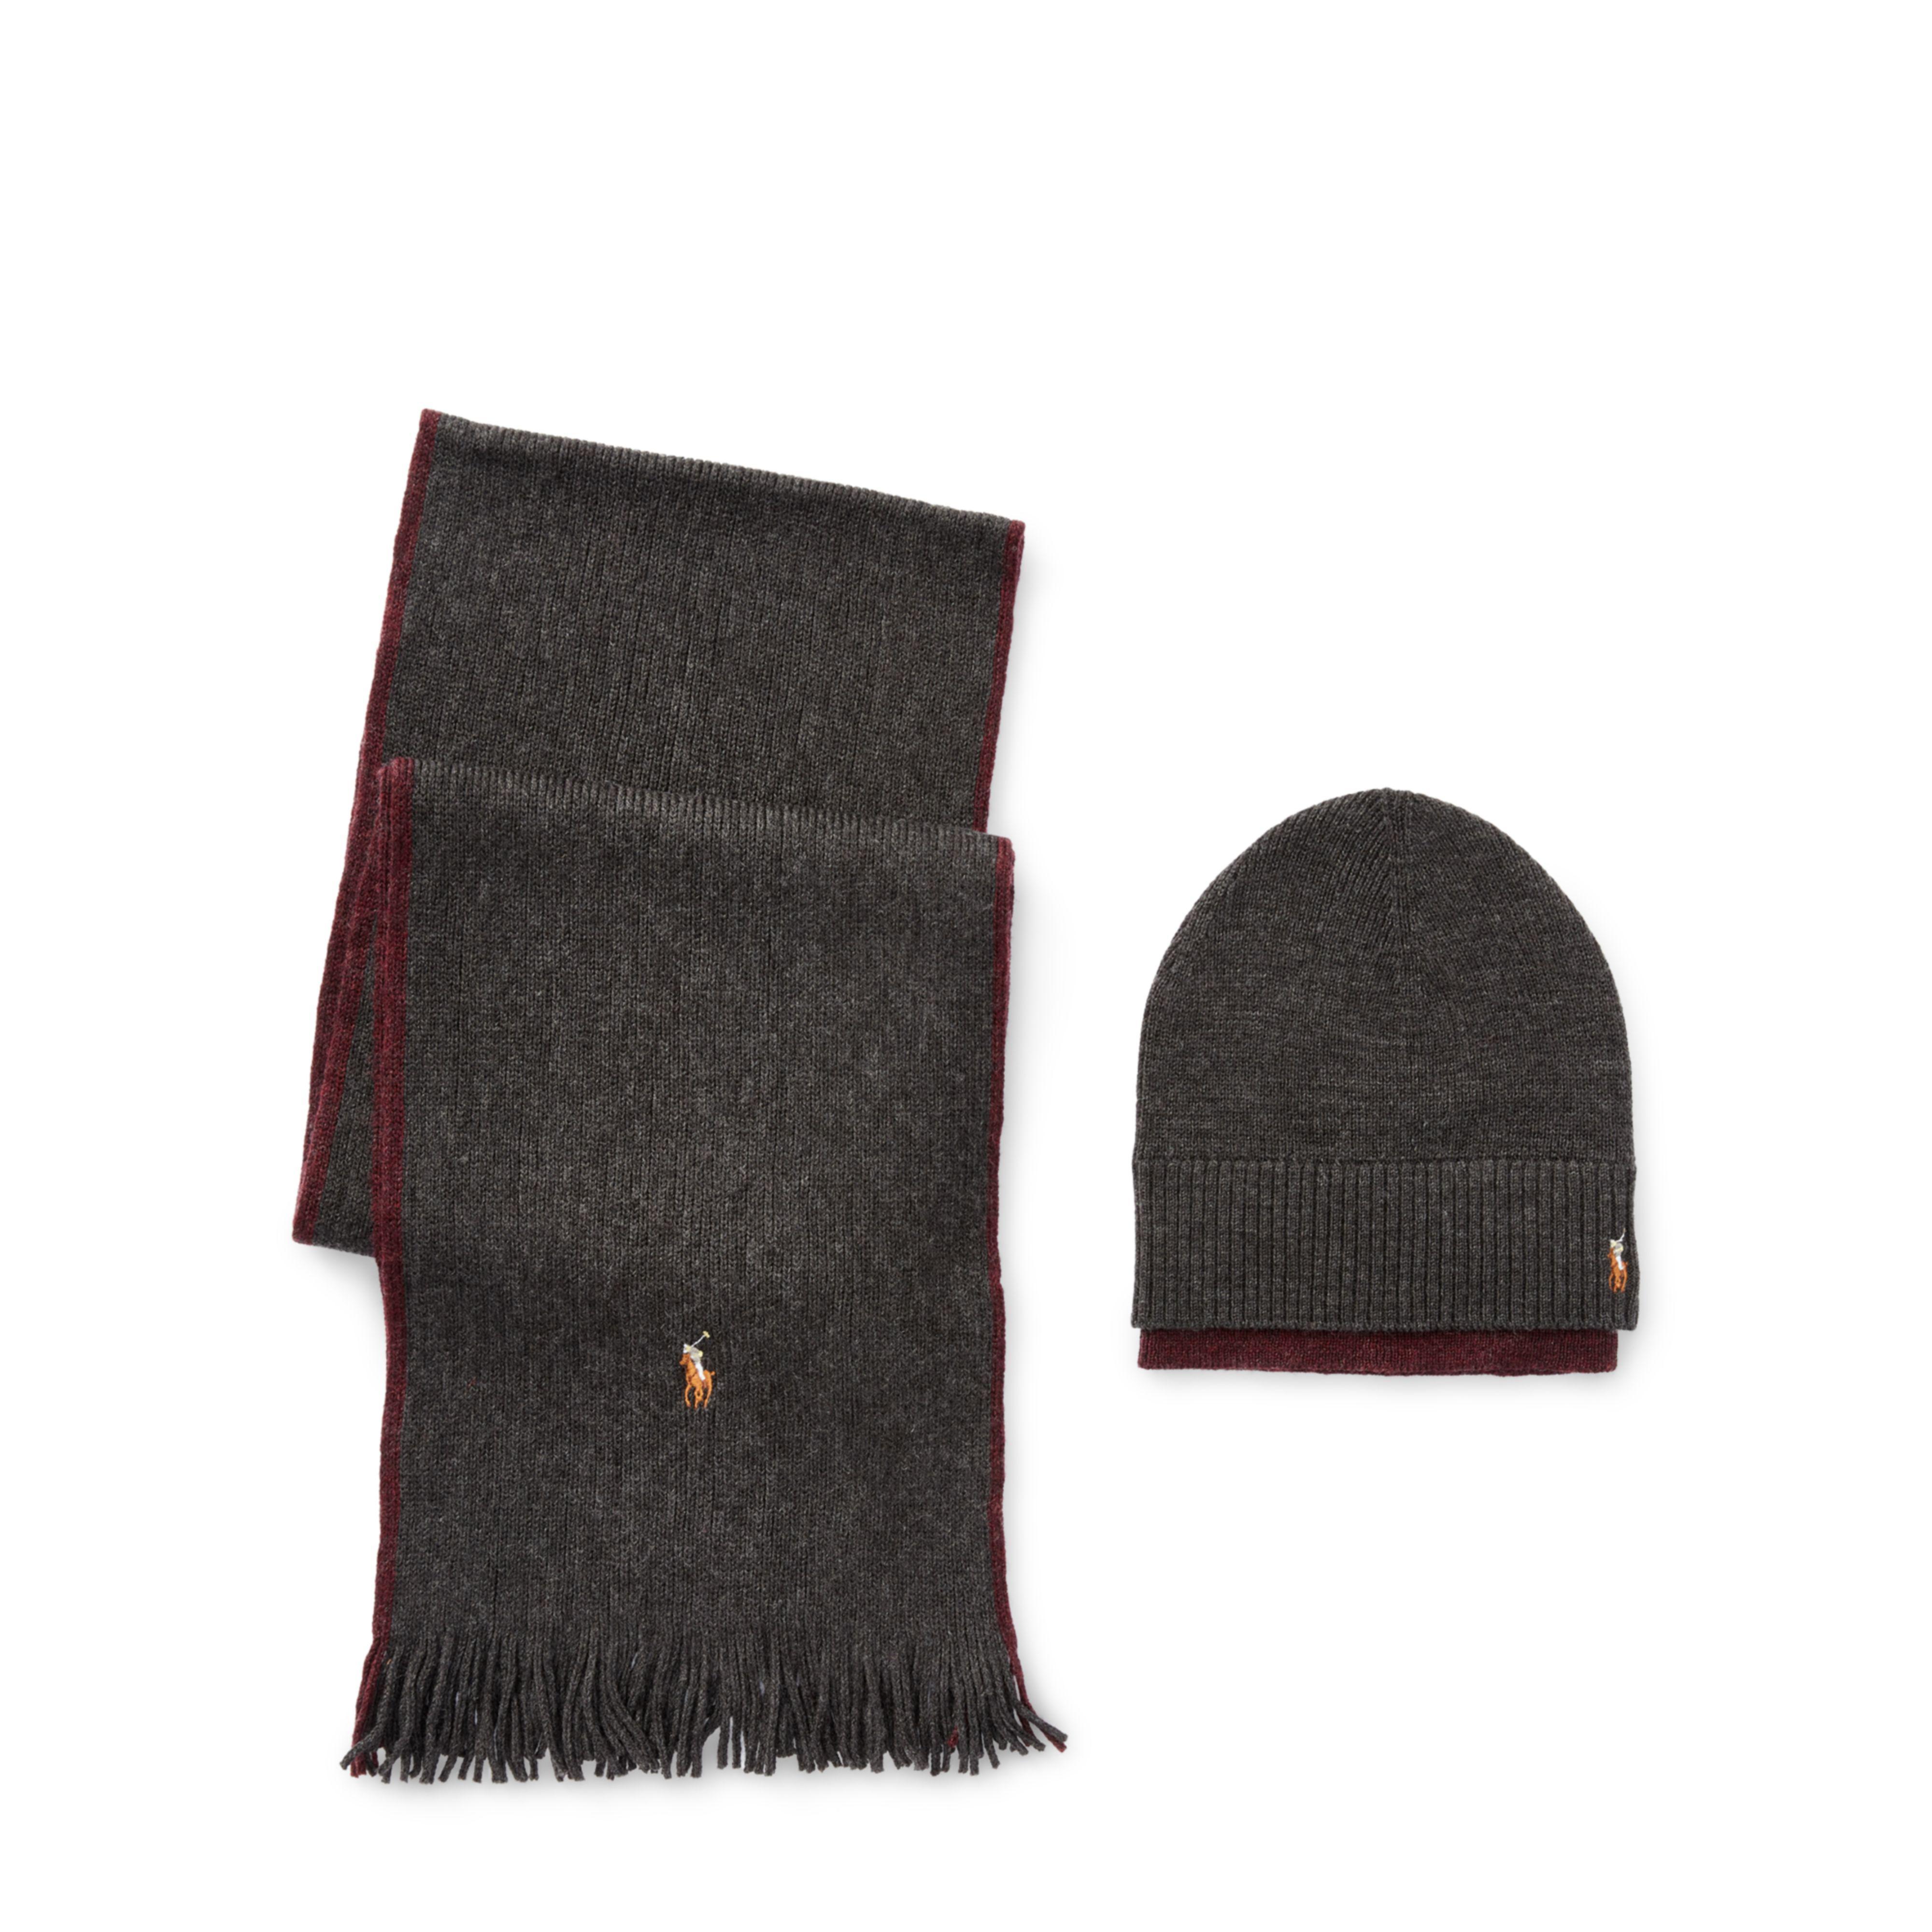 ... wholesale lyst polo ralph lauren merino hat scarf gift set in black for  men 20214 28afa b7364e60fcbb